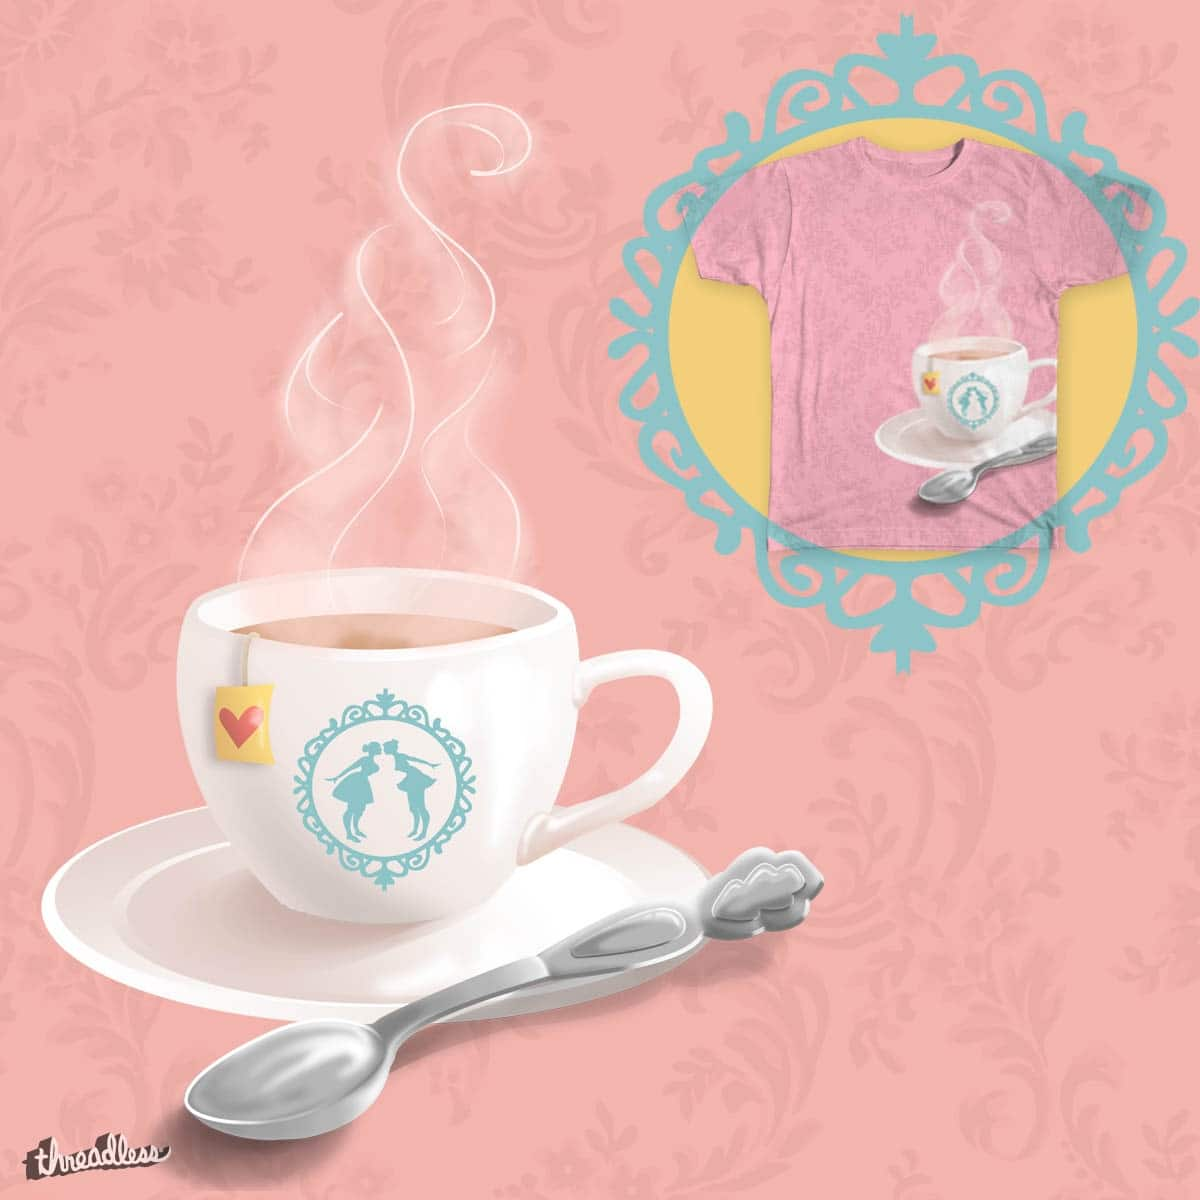 Tea & Kisses by lise-e on Threadless